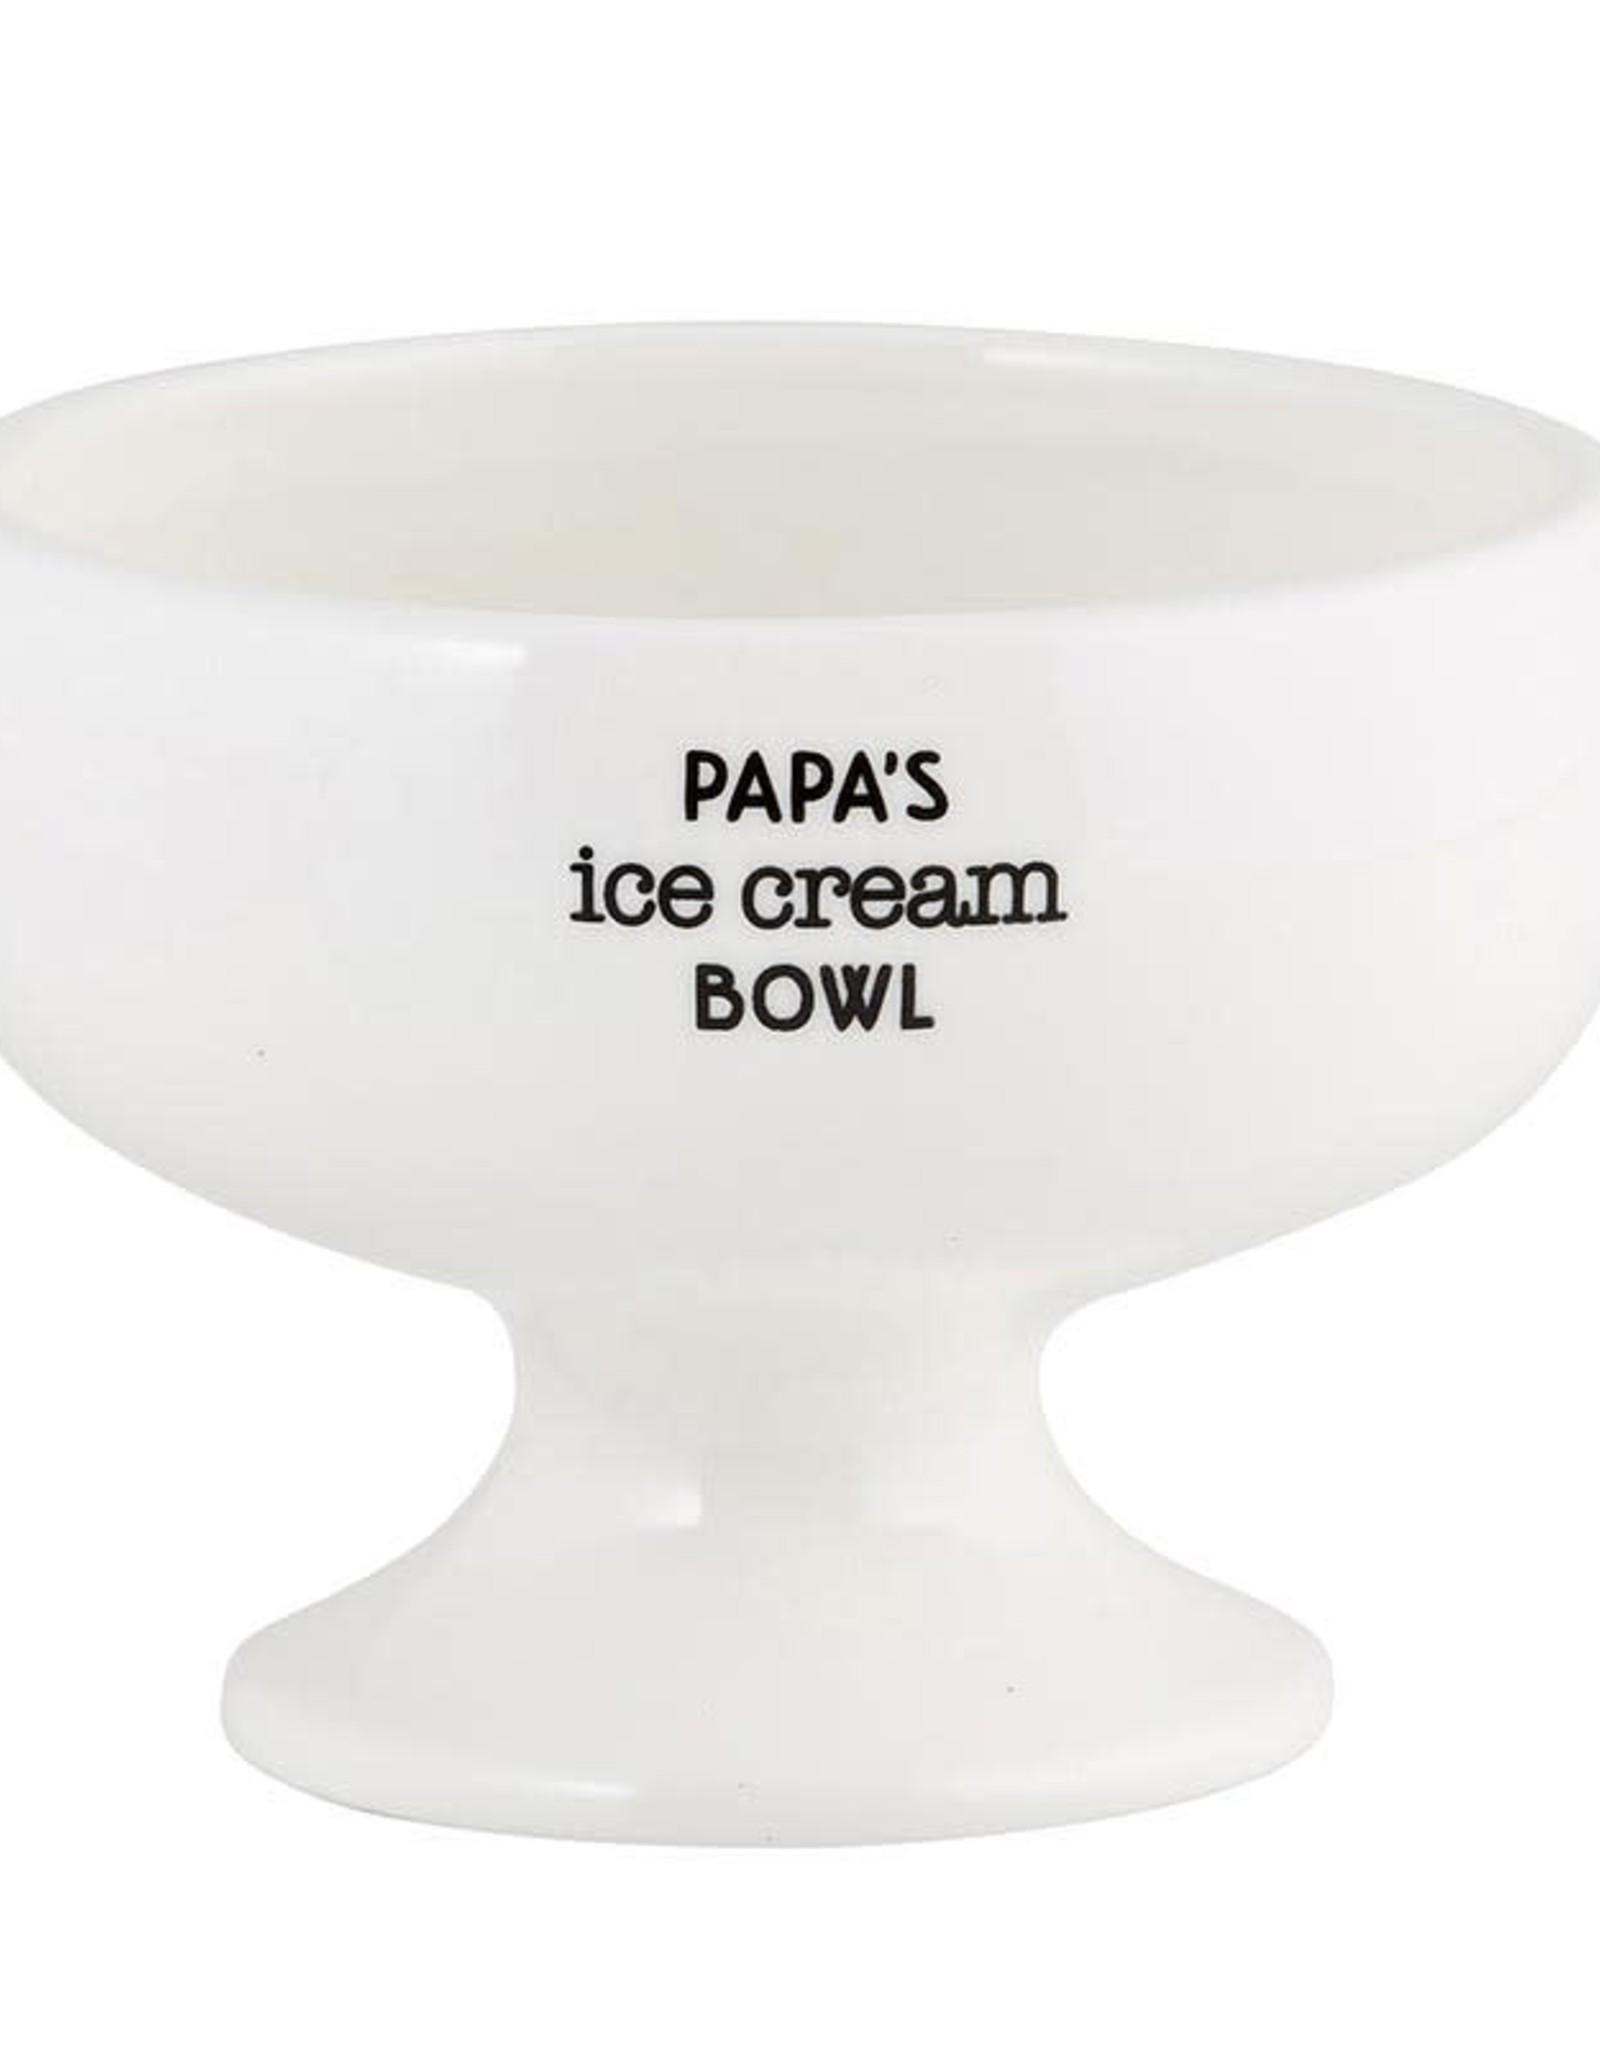 Papa's White Ceramic Ice Cream Bowl